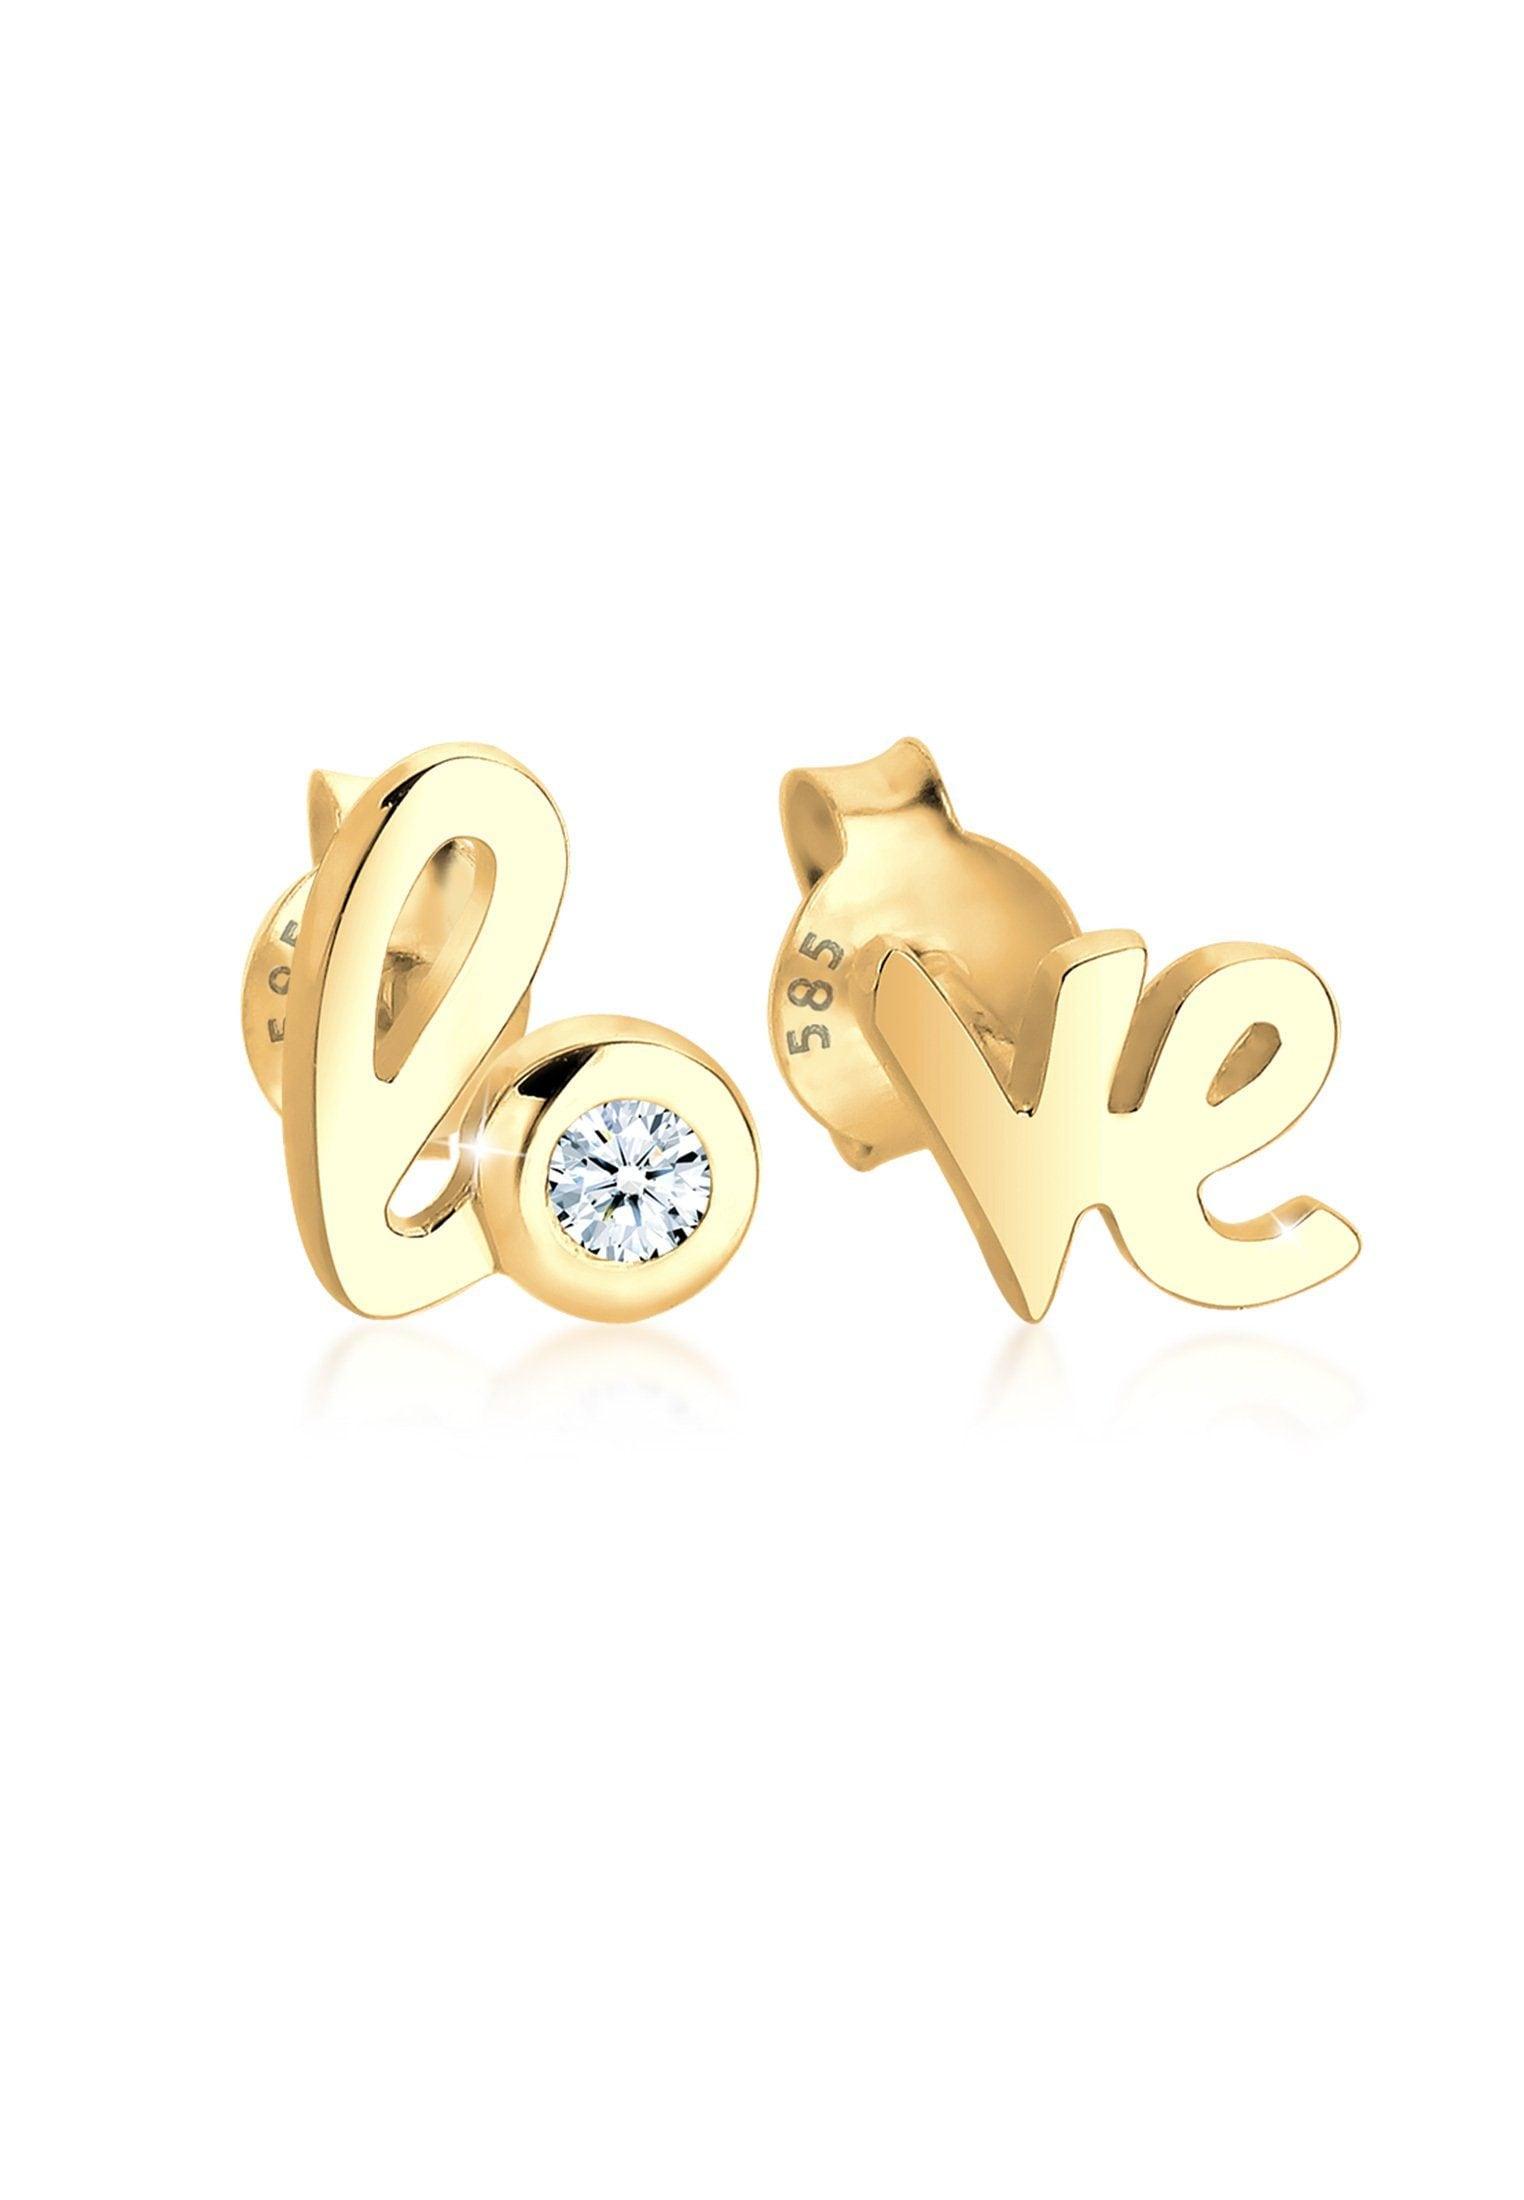 Diamore Paar Ohrstecker Love Wordings Liebe Diamant 003 ct 585 Gelbgold | Schmuck > Ohrschmuck & Ohrringe > Ohrstecker | Diamore